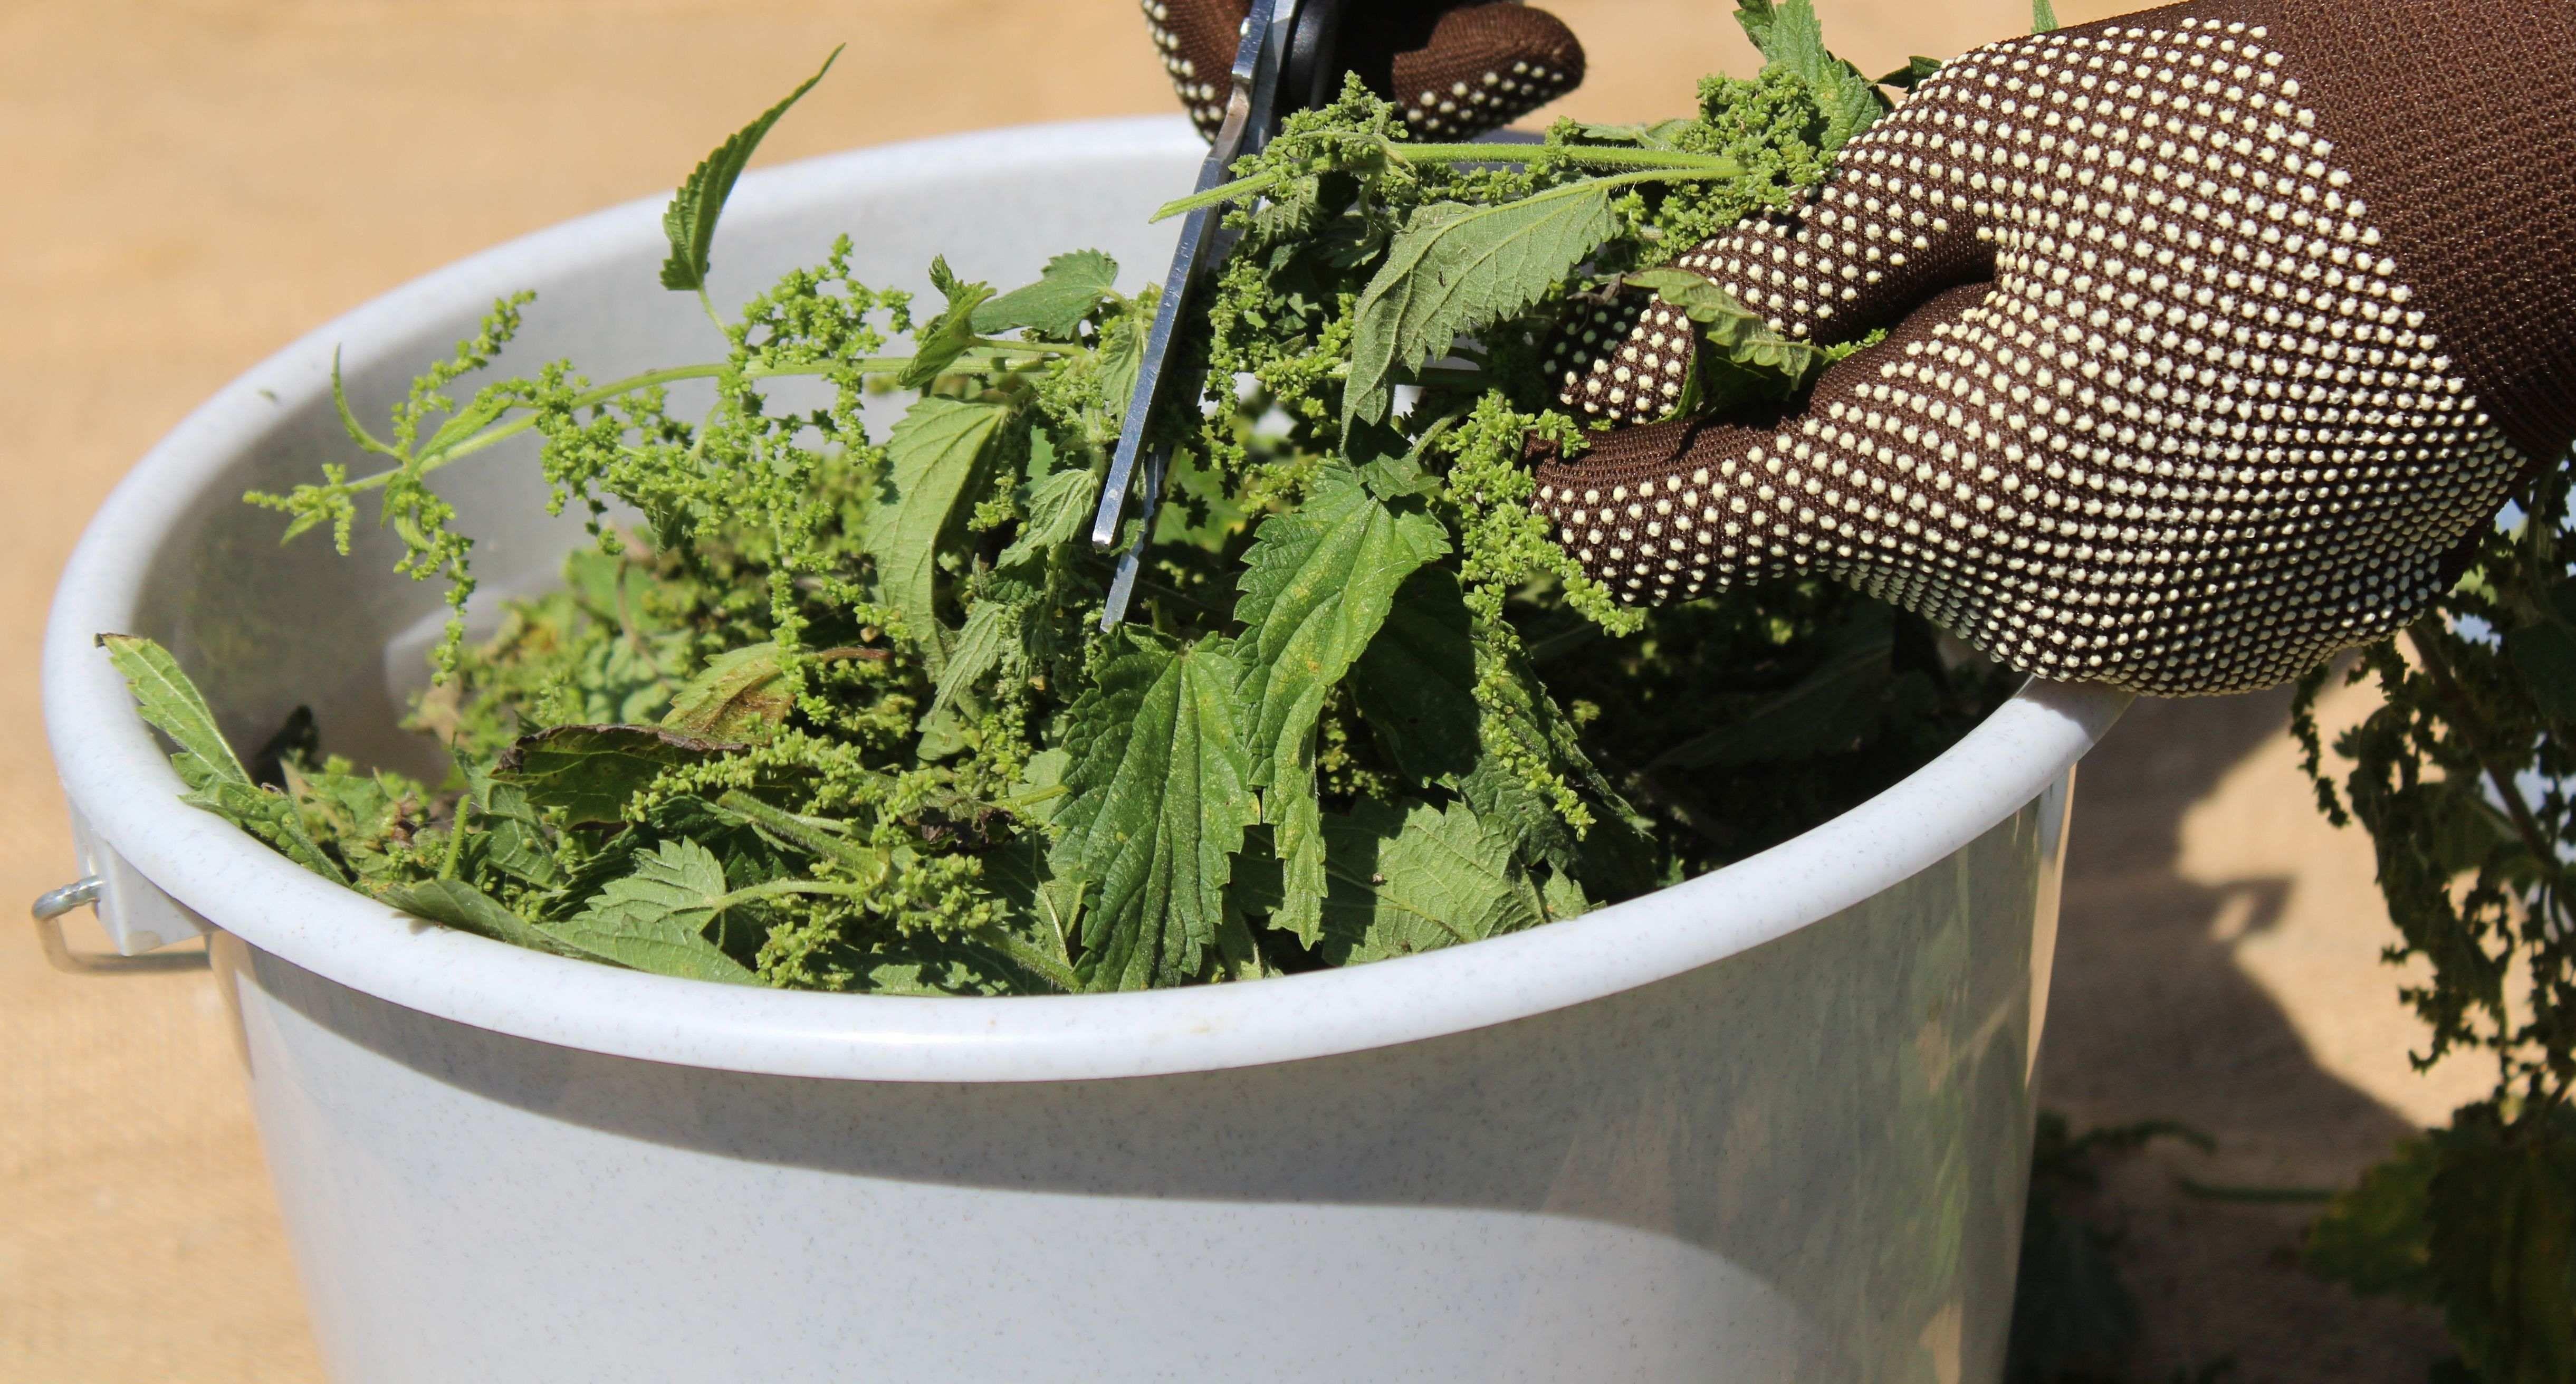 How to make liquid fertilisers at home